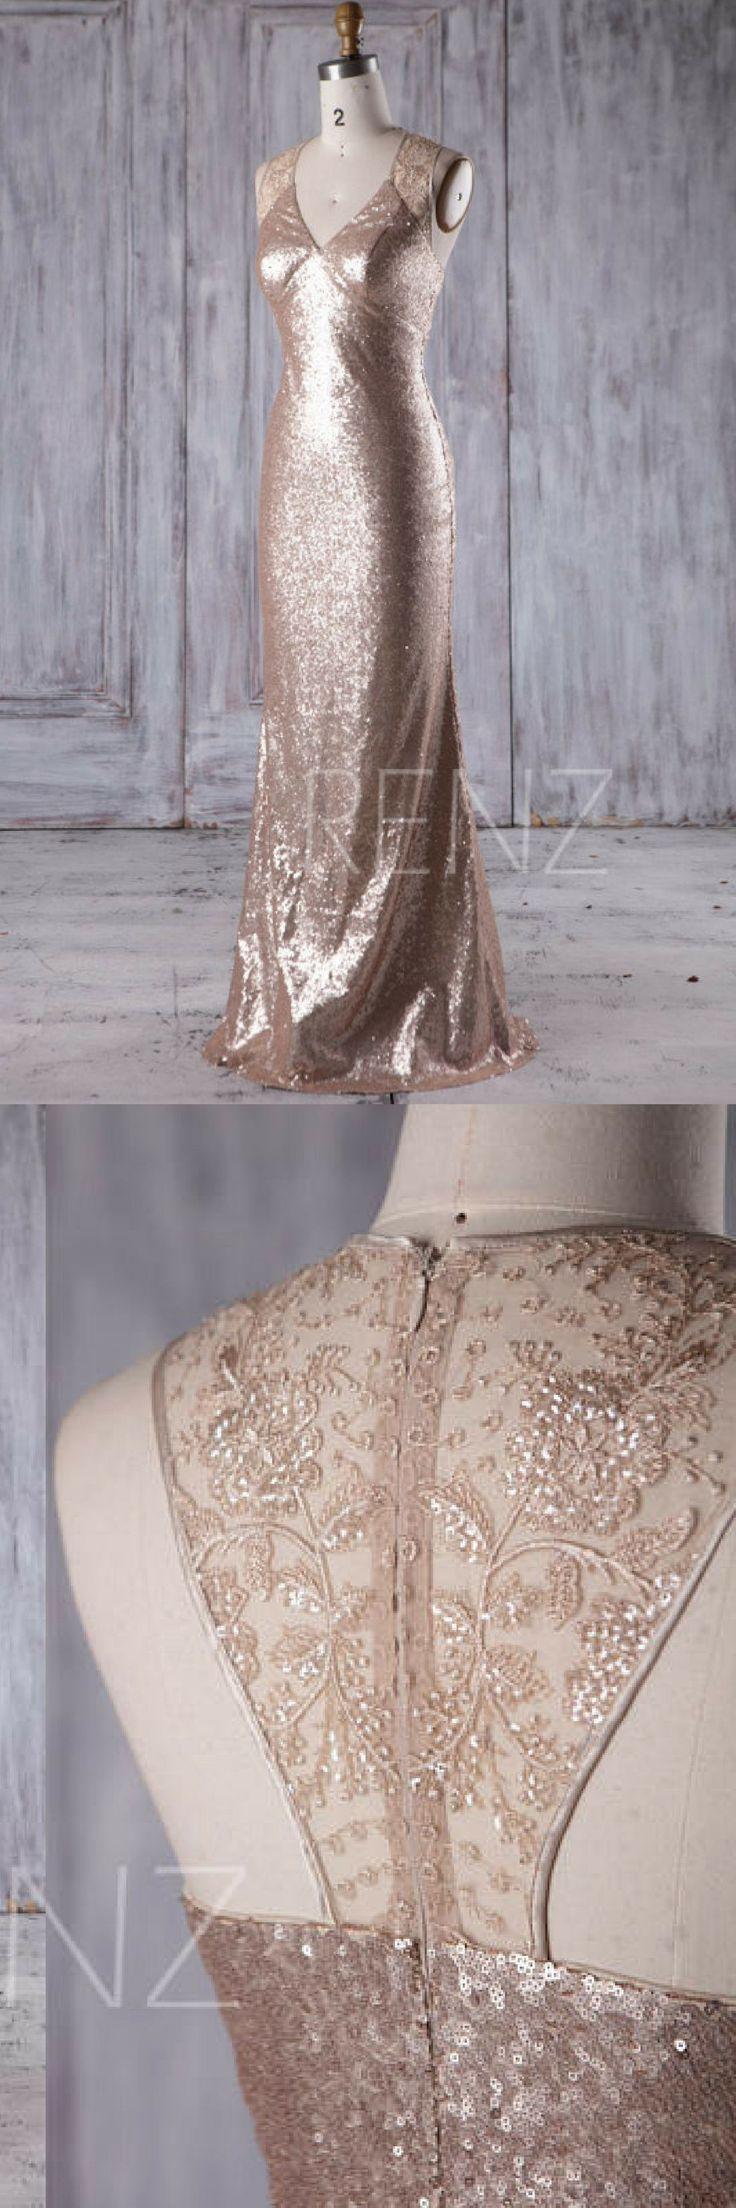 Bridesmaid Dress Tan Sequin  V Neck Halter Wedding Dress,Beaded Illusion Lace Long Prom Dress,Luxury  Bodycon Evening Dress Full Length #promdresses #ad #bridesmaiddresses #womensfashion